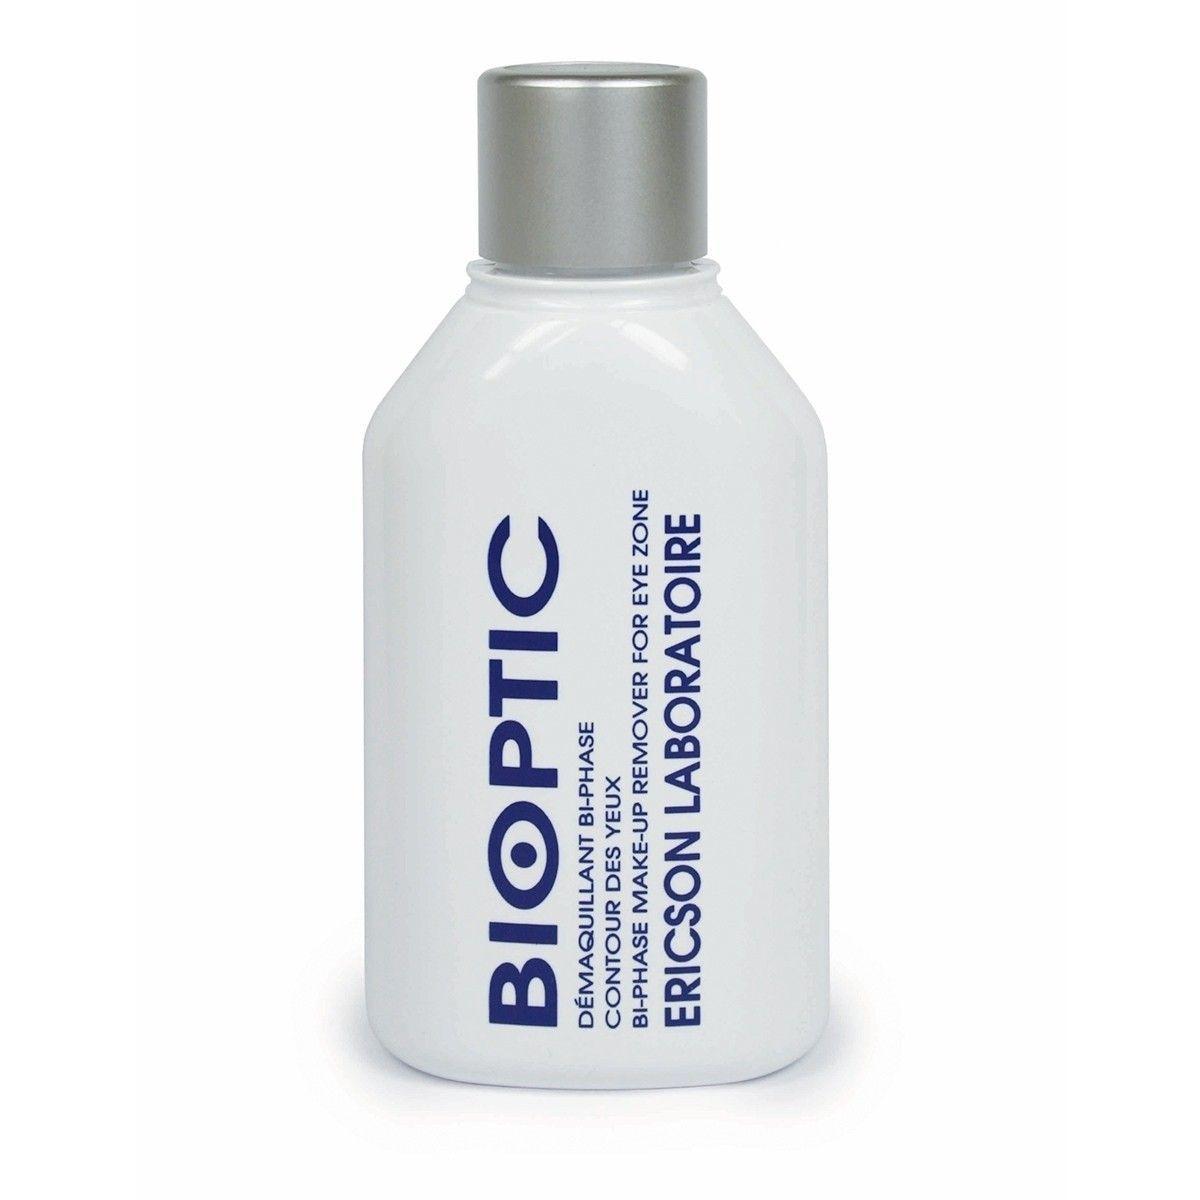 Afbeelding van Ericson Laboratoire Bioptic Bi Phase Make Up Remover Complete oogverzorging Beauty